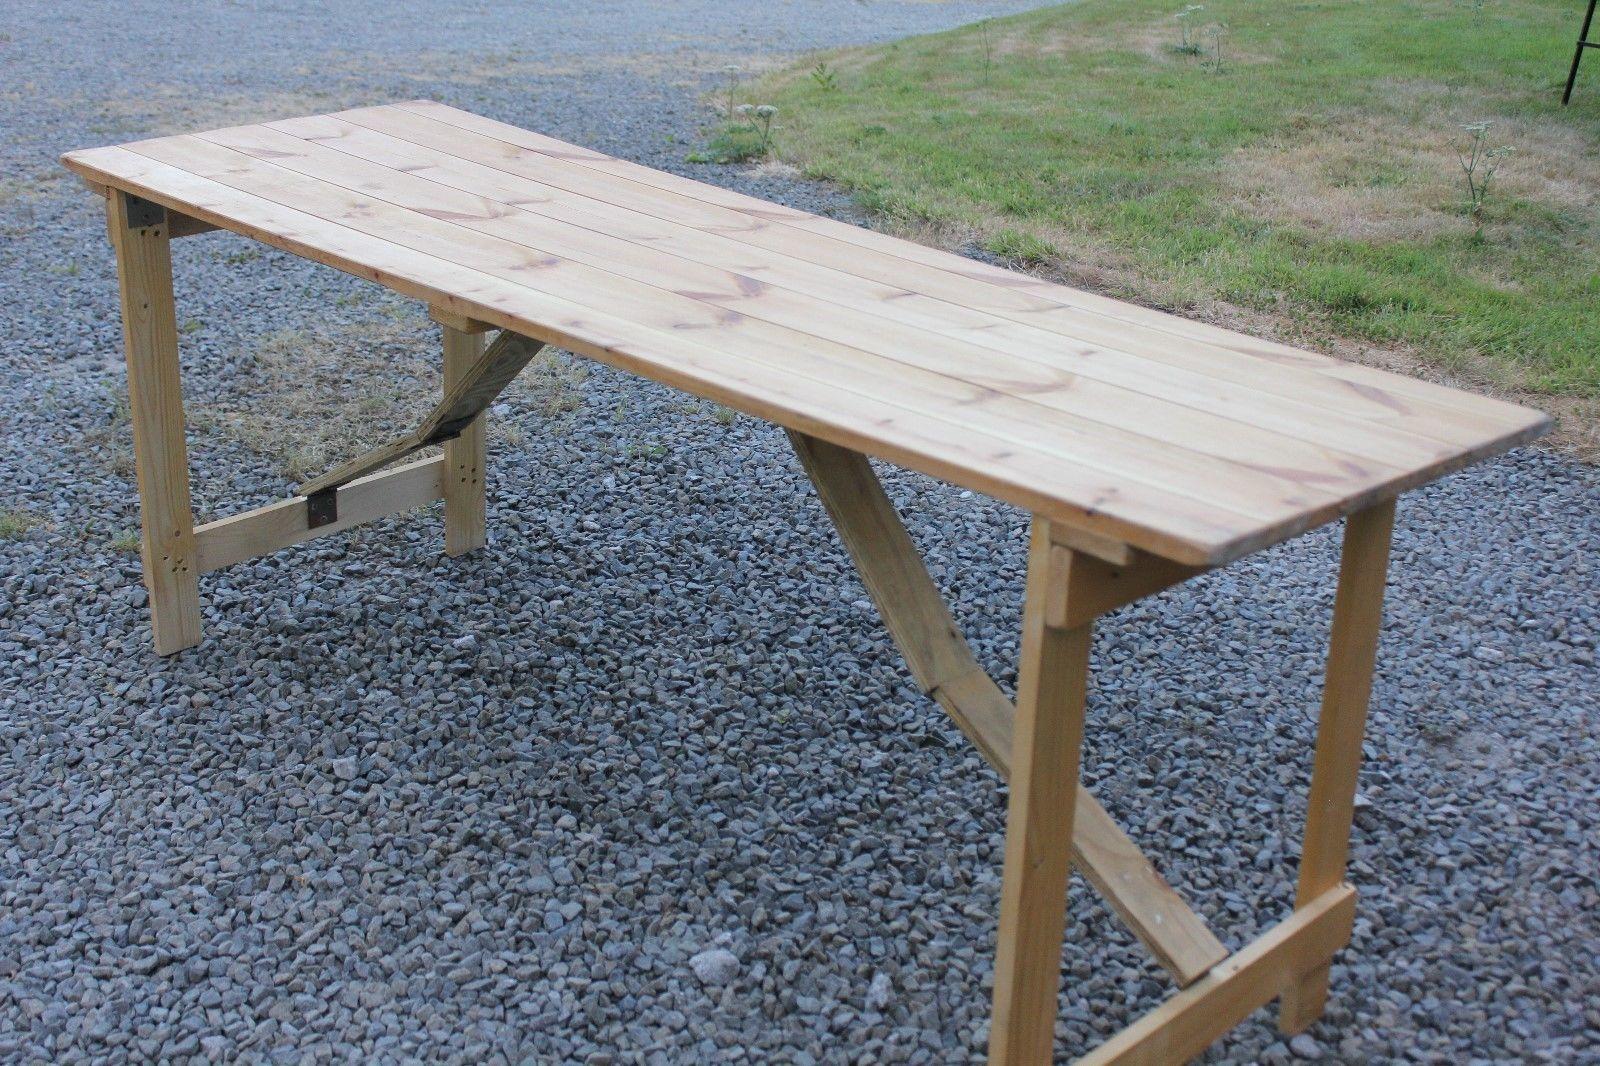 Wooden Trestle Table 6 X 2 With Folding Legs Ebay Wooden Trestle Table Trestle Table Table